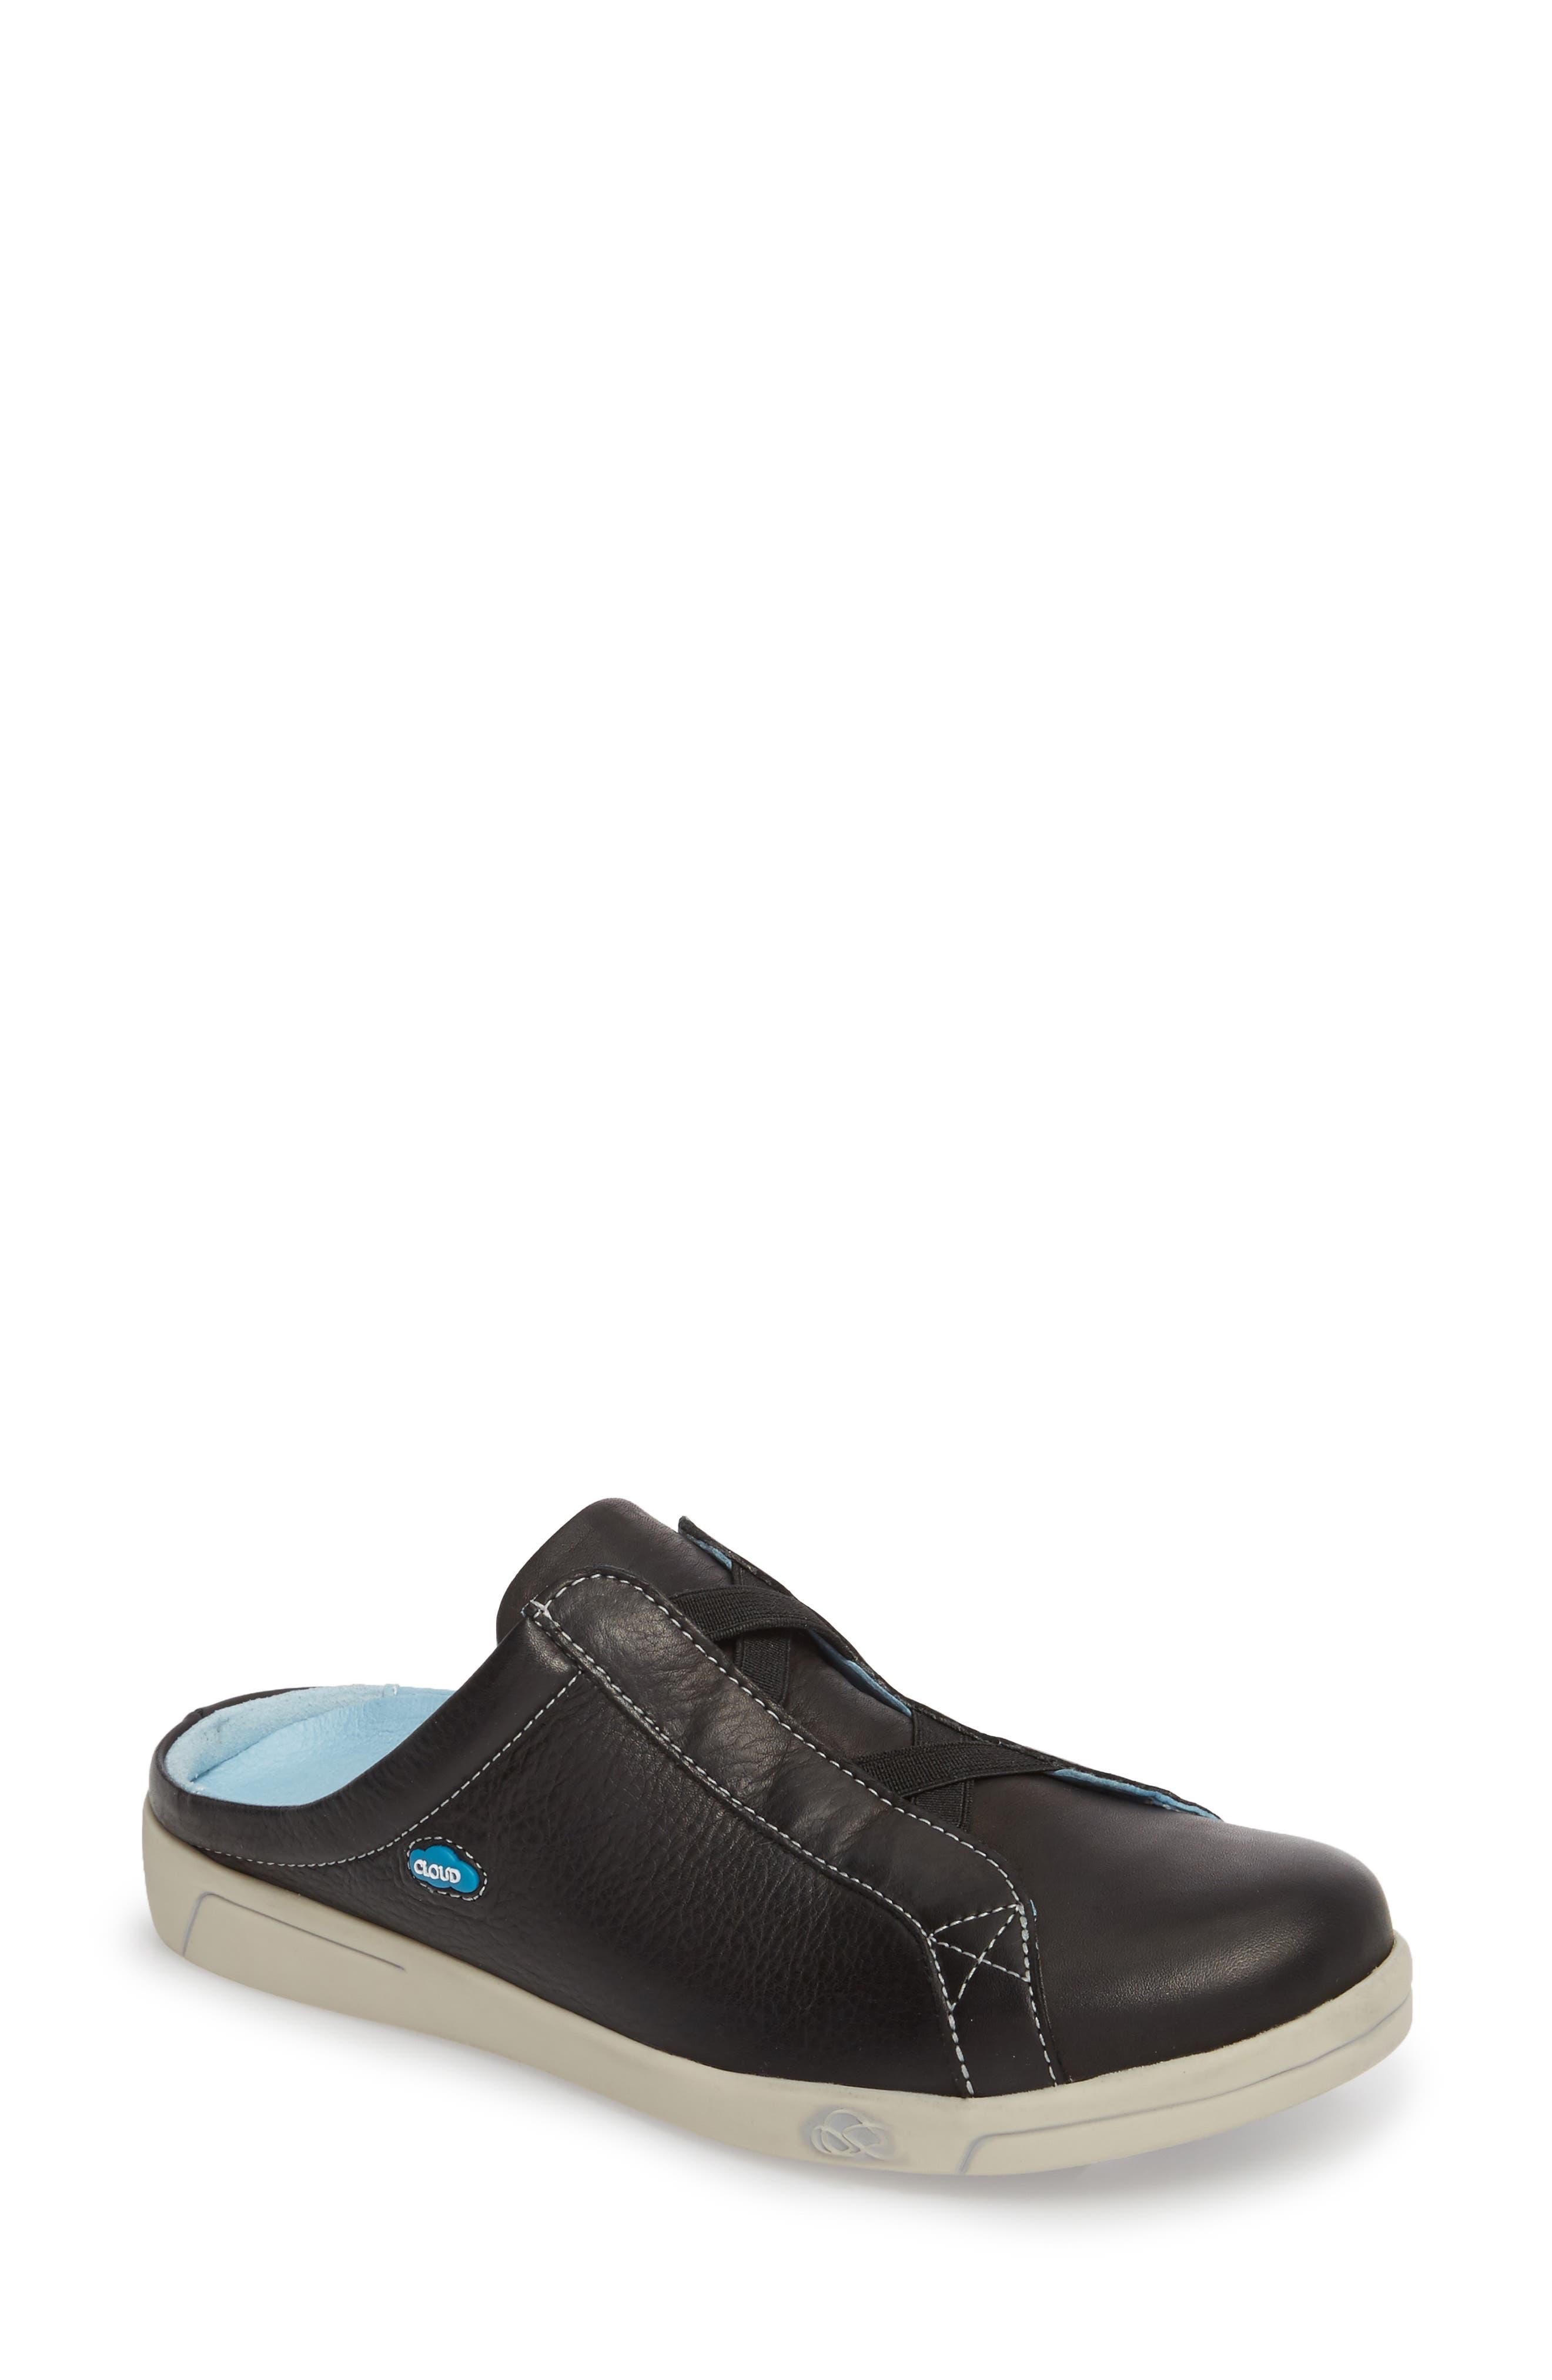 Arizona Sneaker,                         Main,                         color, BLACK LEATHER